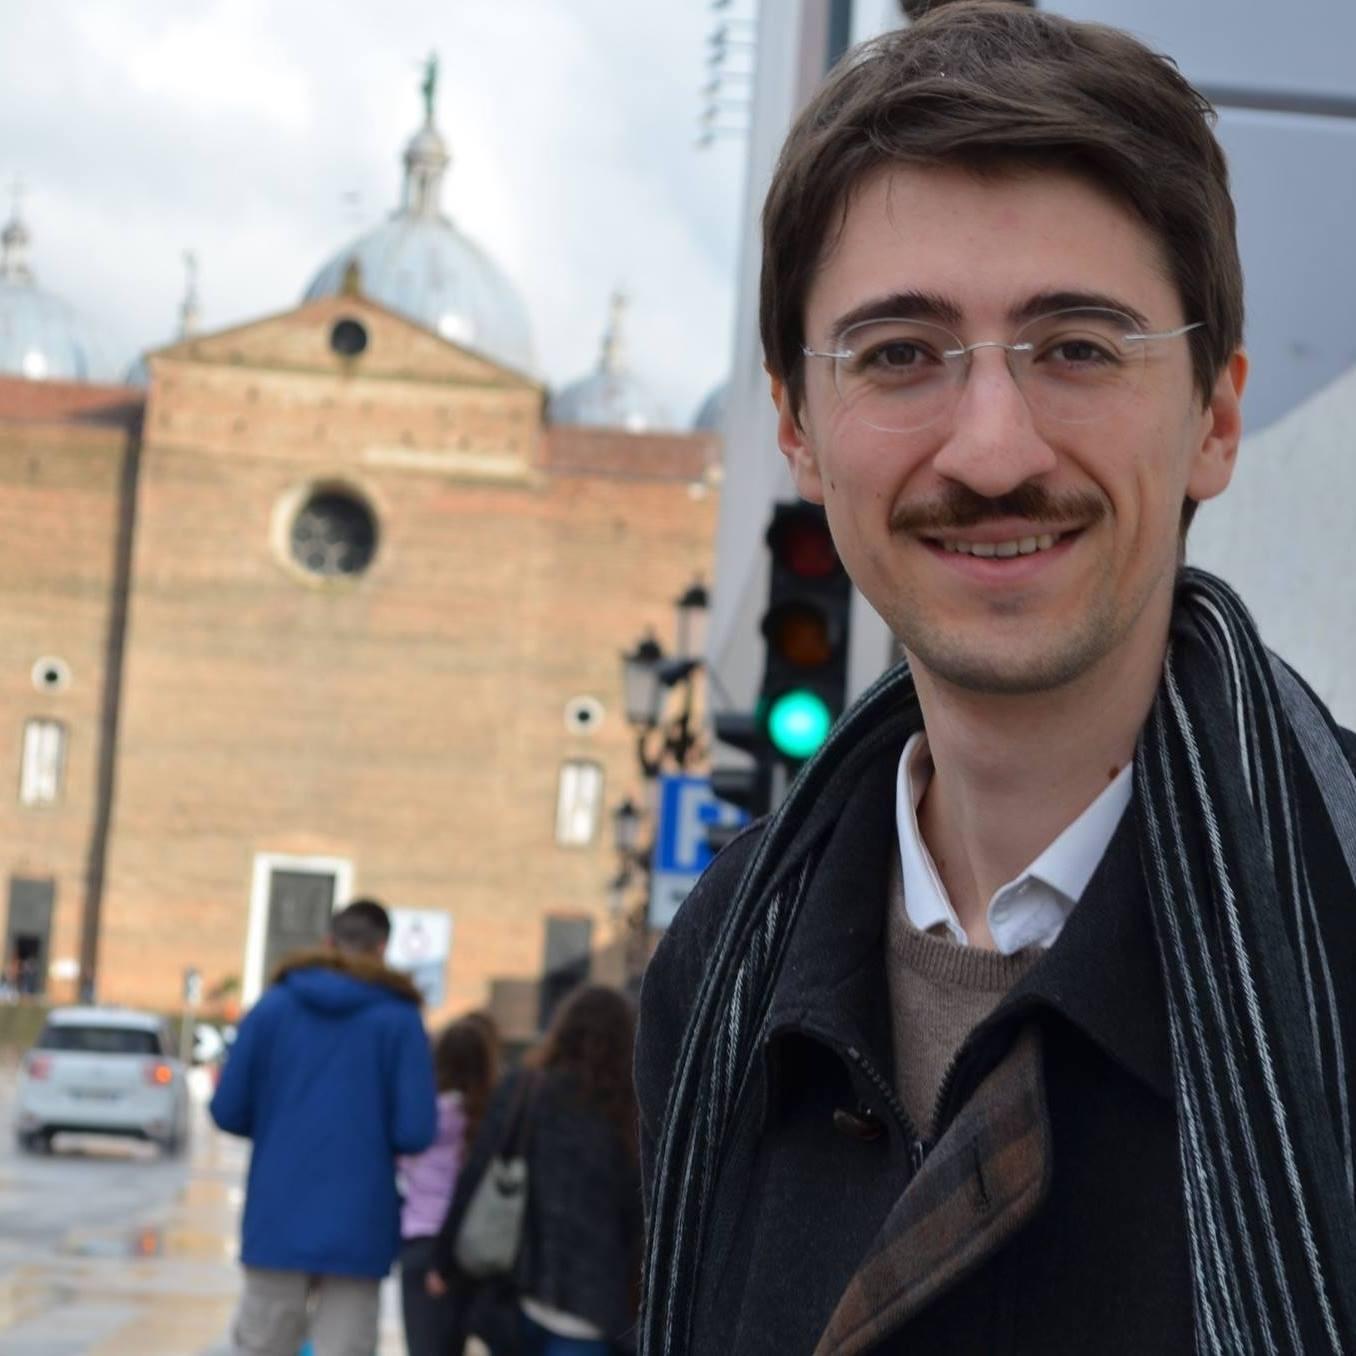 Michele Soldavini